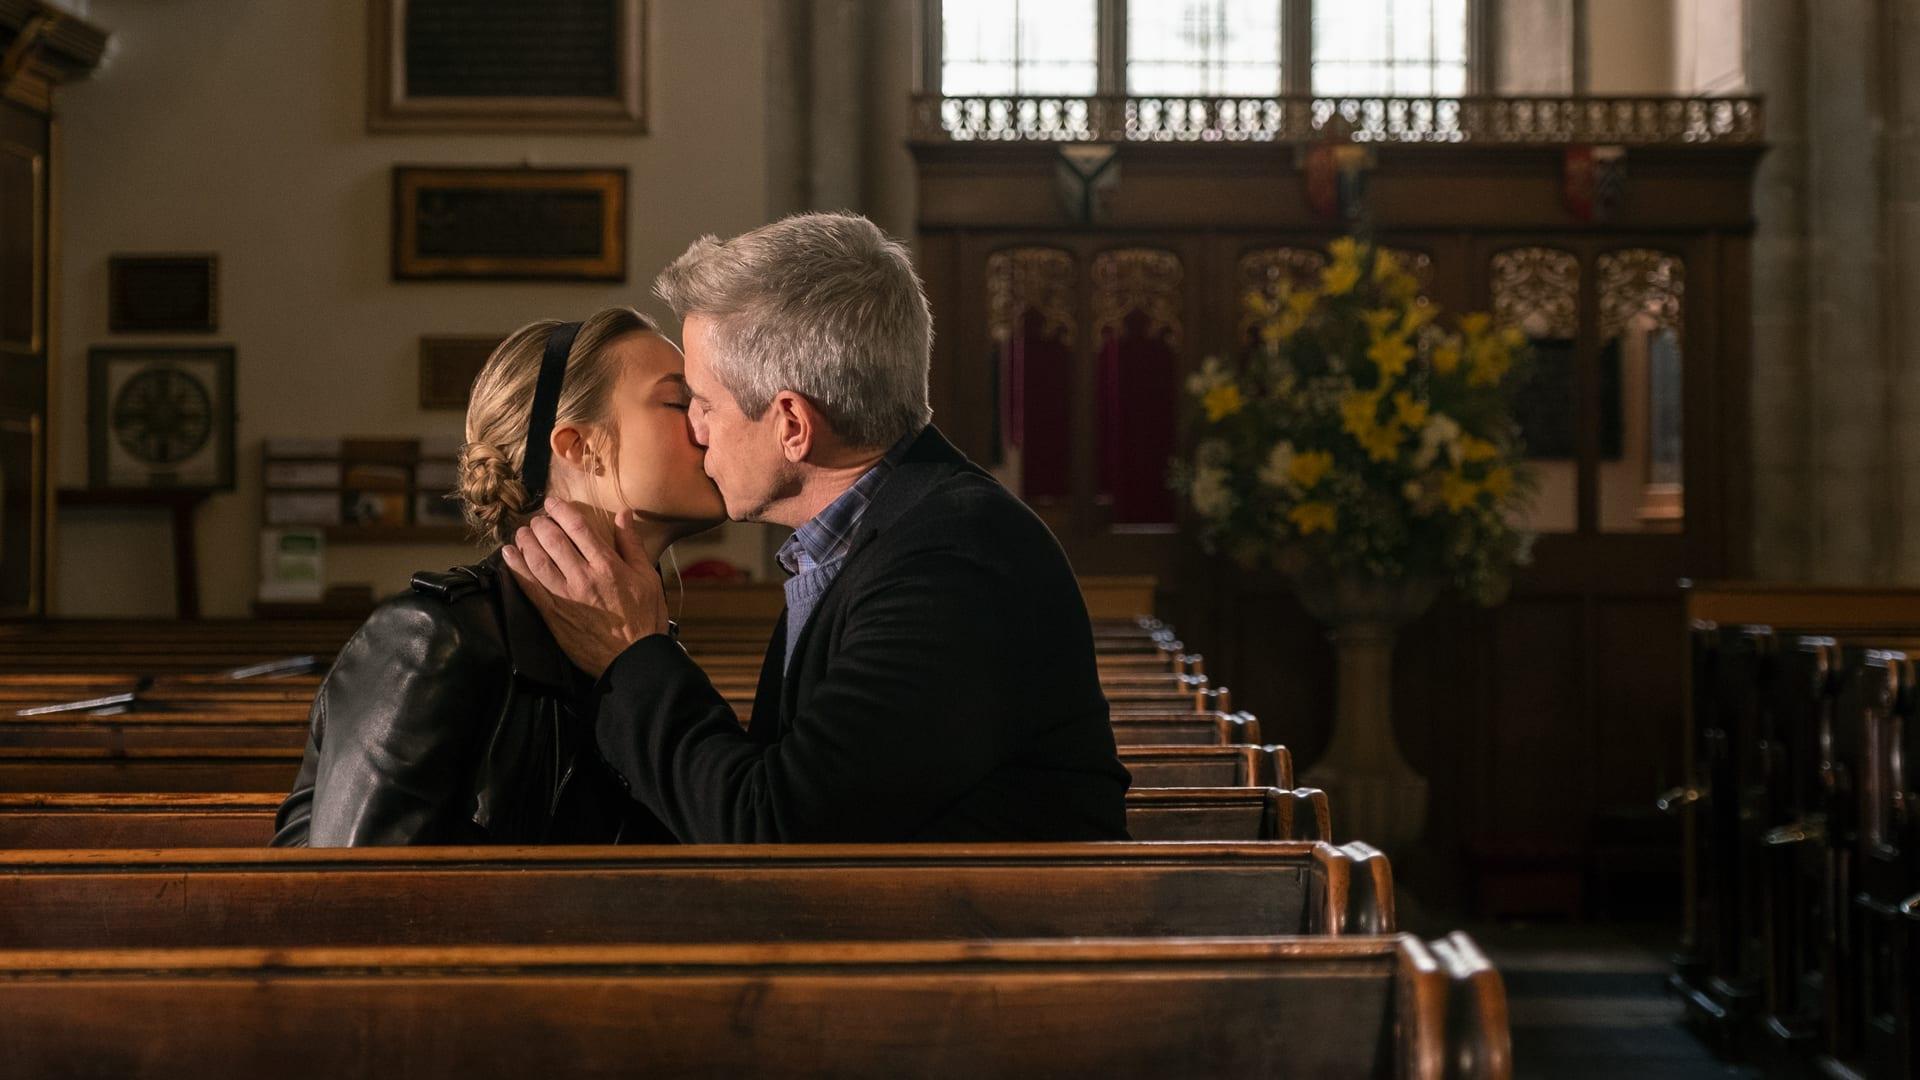 Online Dating slutar i äktenskapet